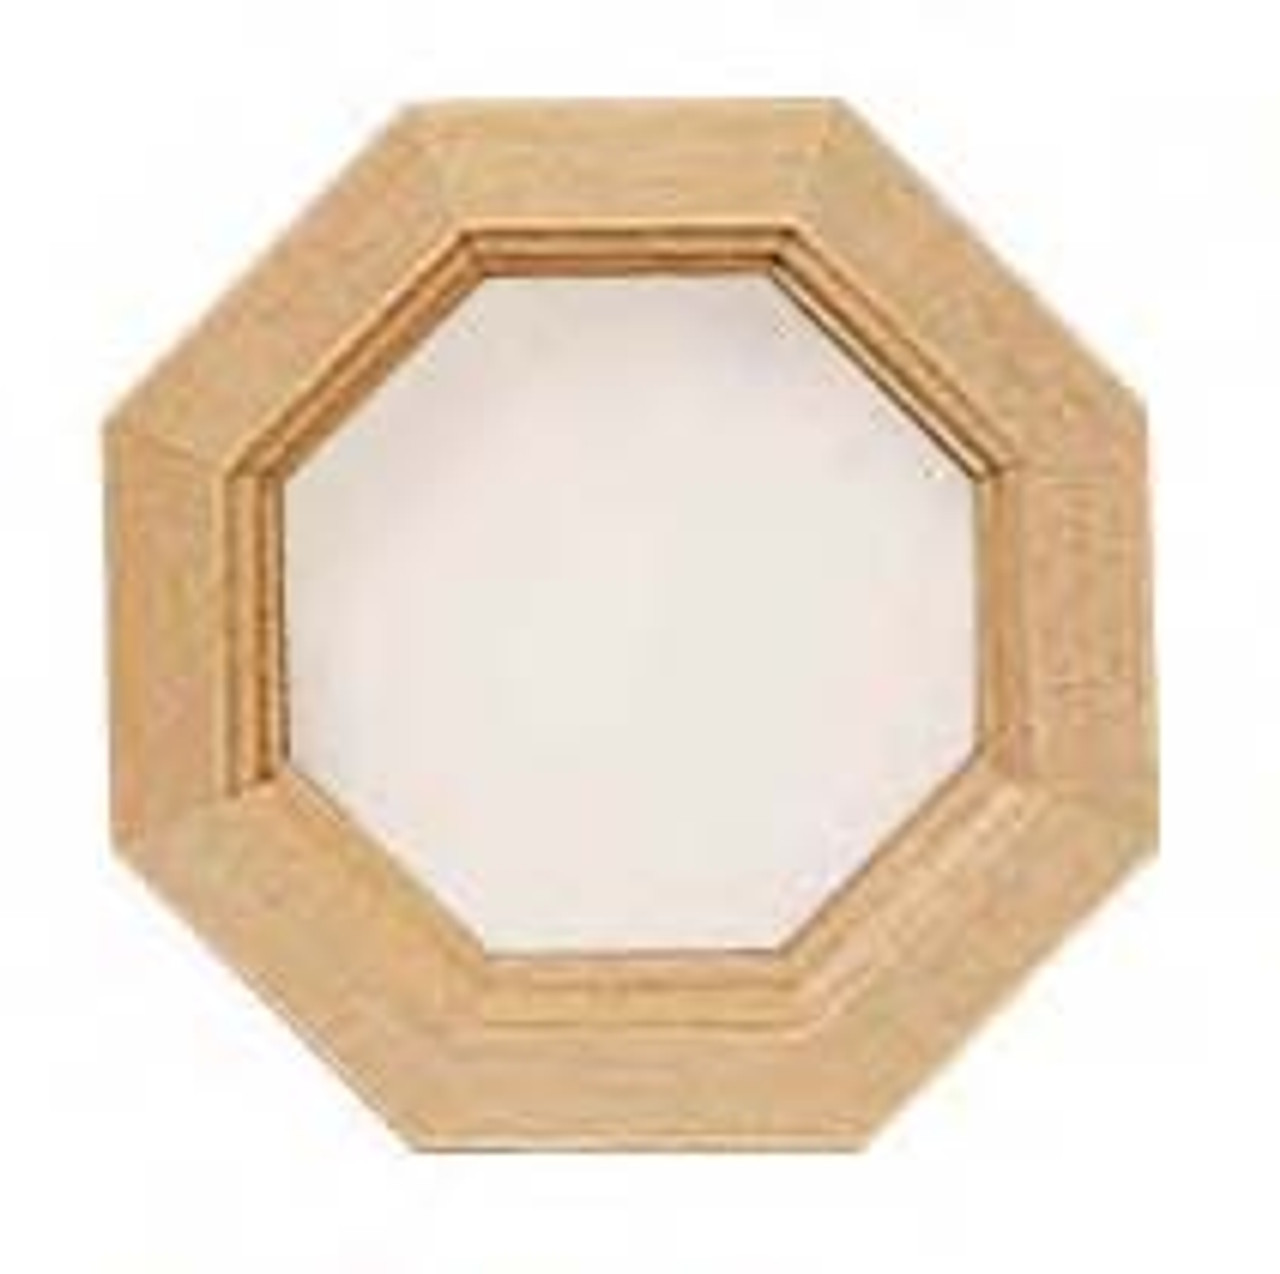 Octagon Non-working Window